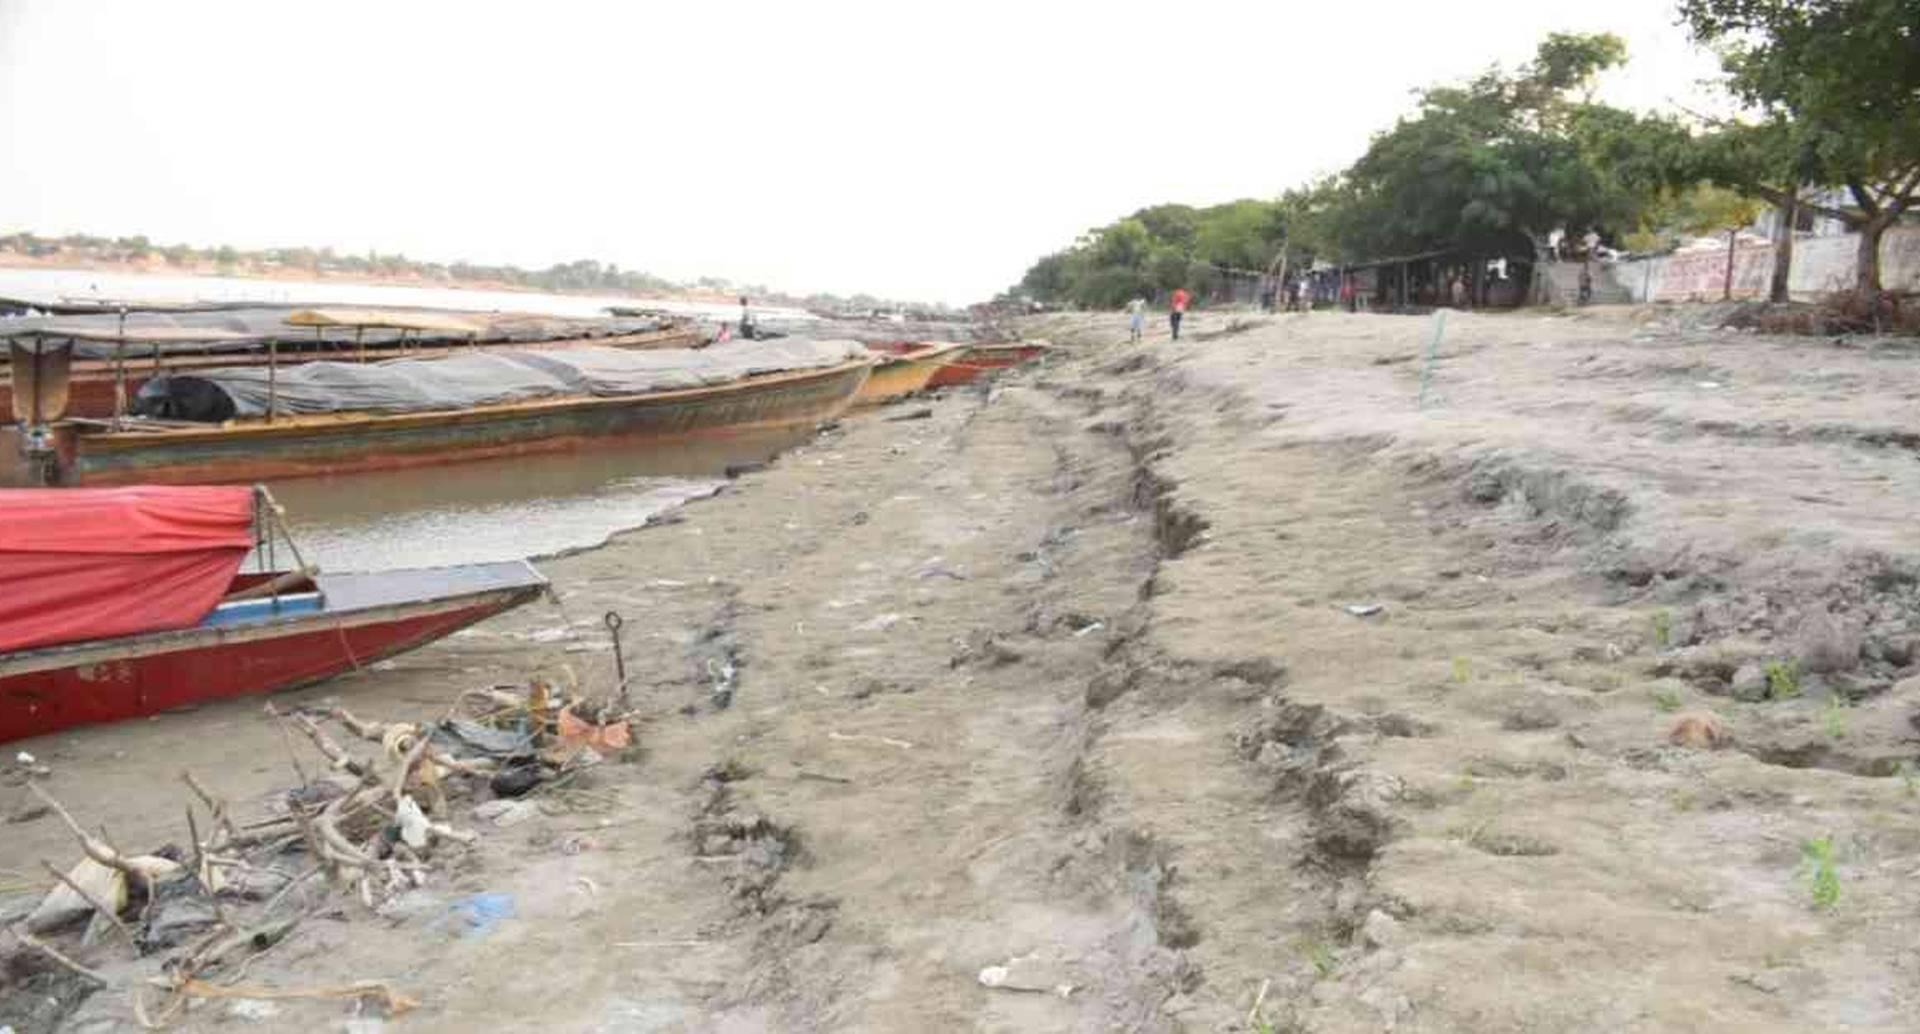 Cerca de tres metros se ha reducido el cauce del río Cauca, a la altura de Magangué (Bolívar). Foto: Alcaldía de Magangué.